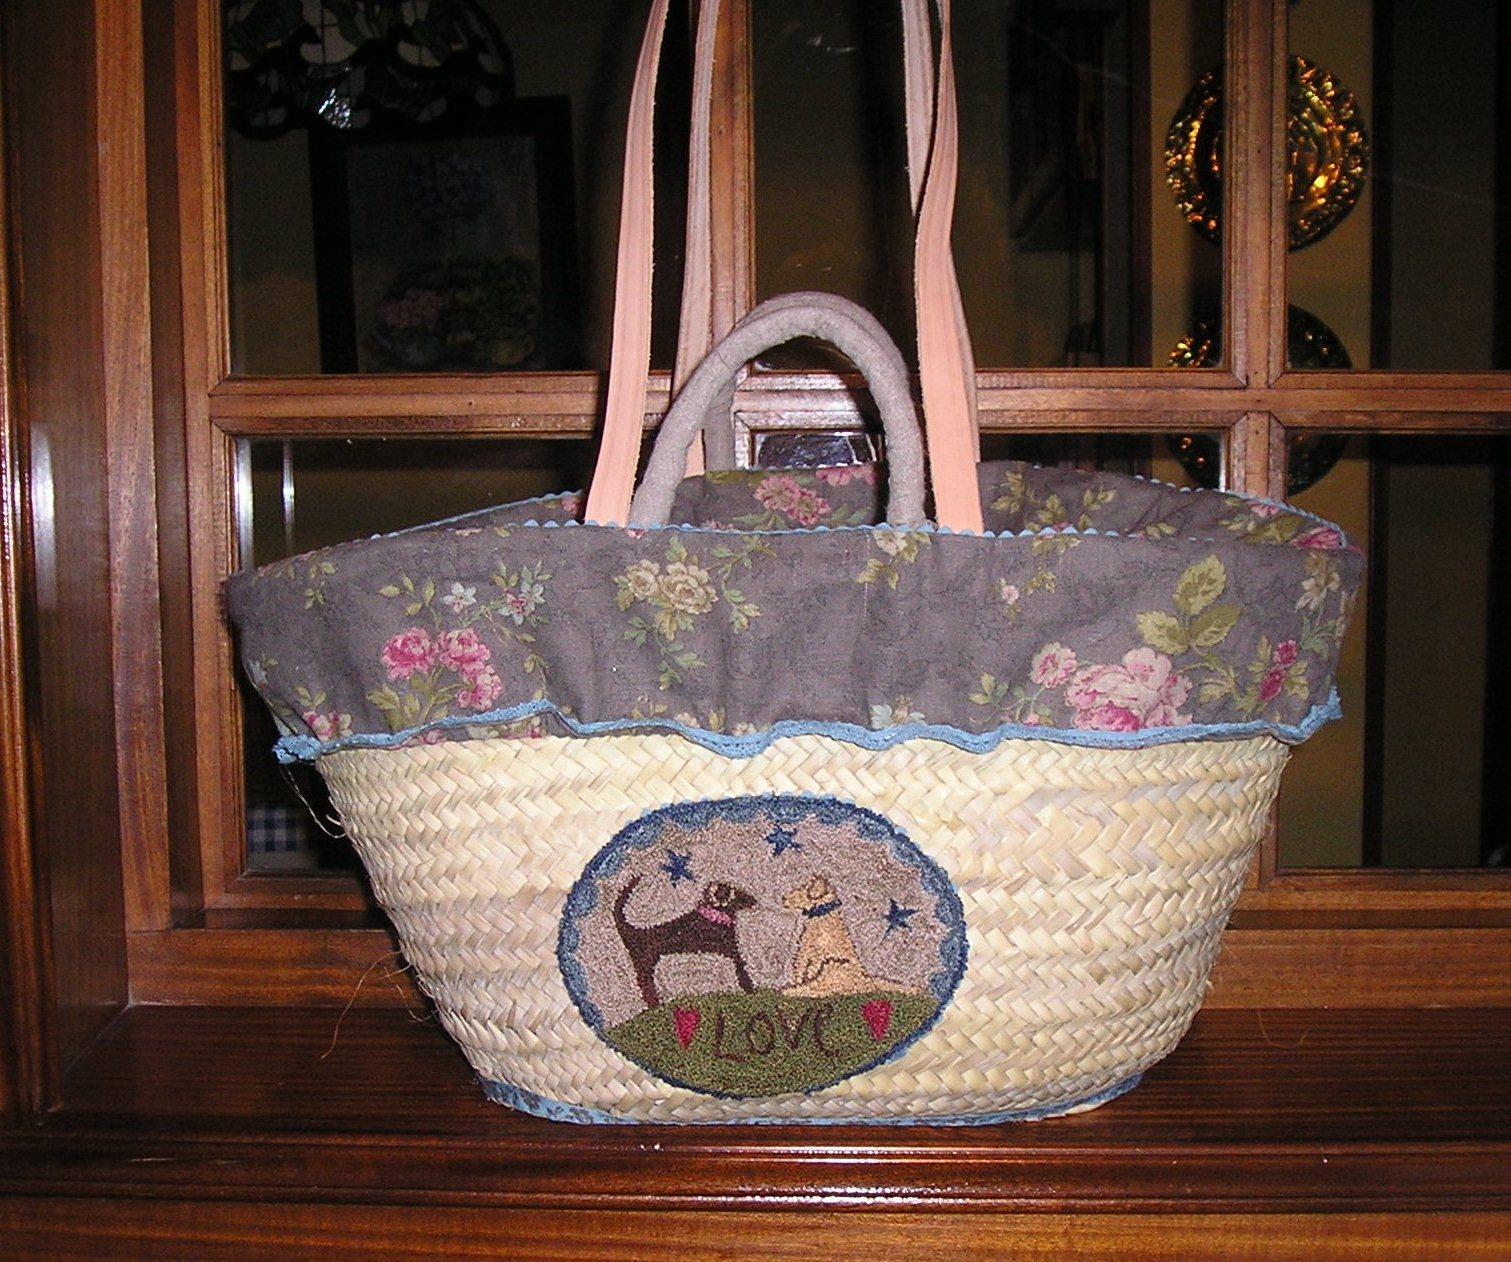 Como decorar una cesta de mimbre imagui - Como forrar una cesta de mimbre ...